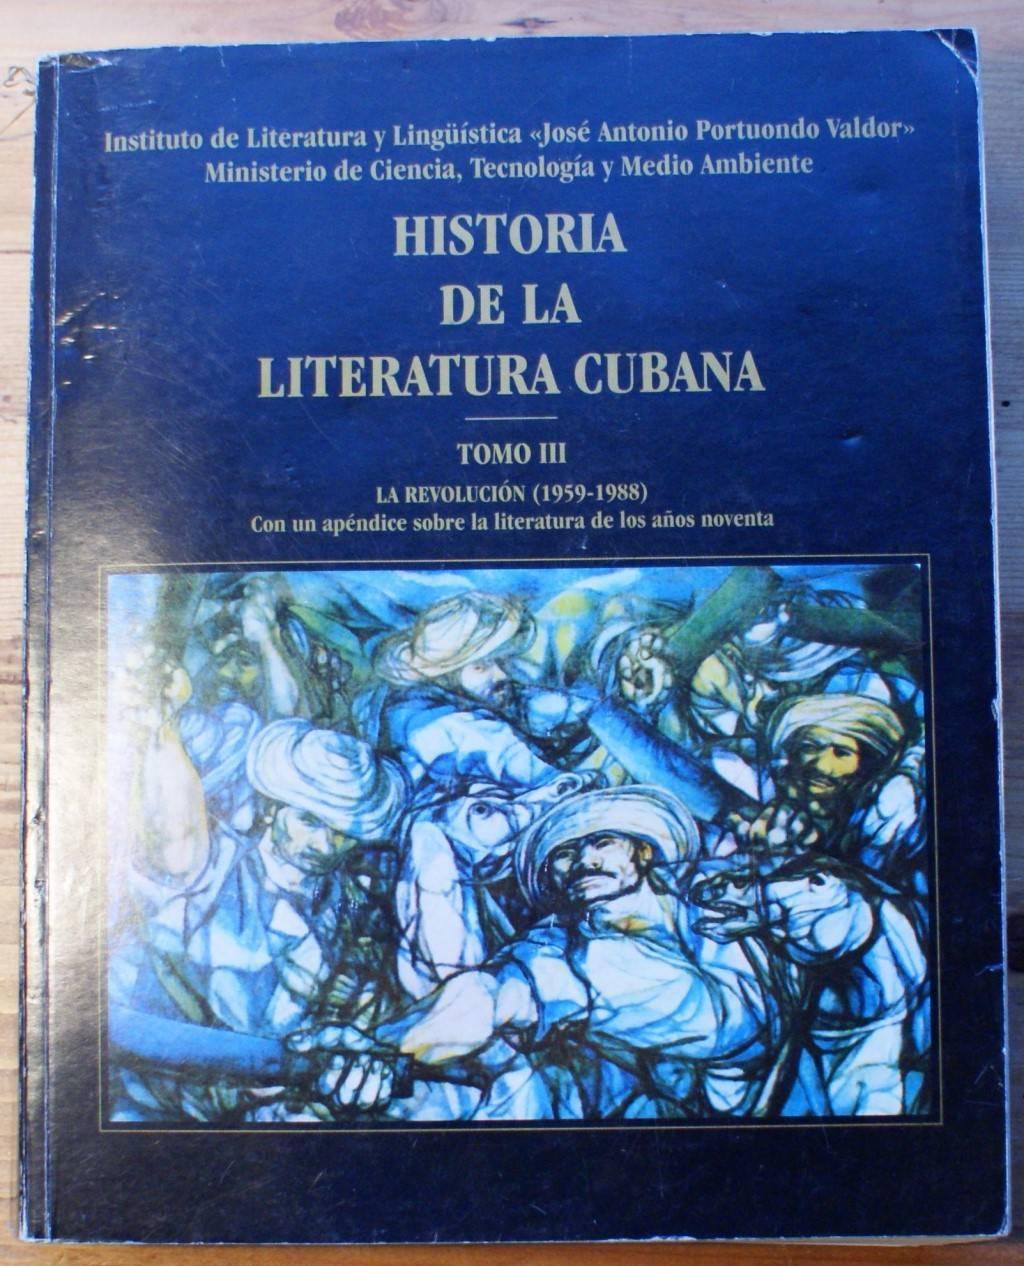 Historia de la literatura cubana - Tomo III - La Revolucion (1959-1988) - jean-Pierre Leclère